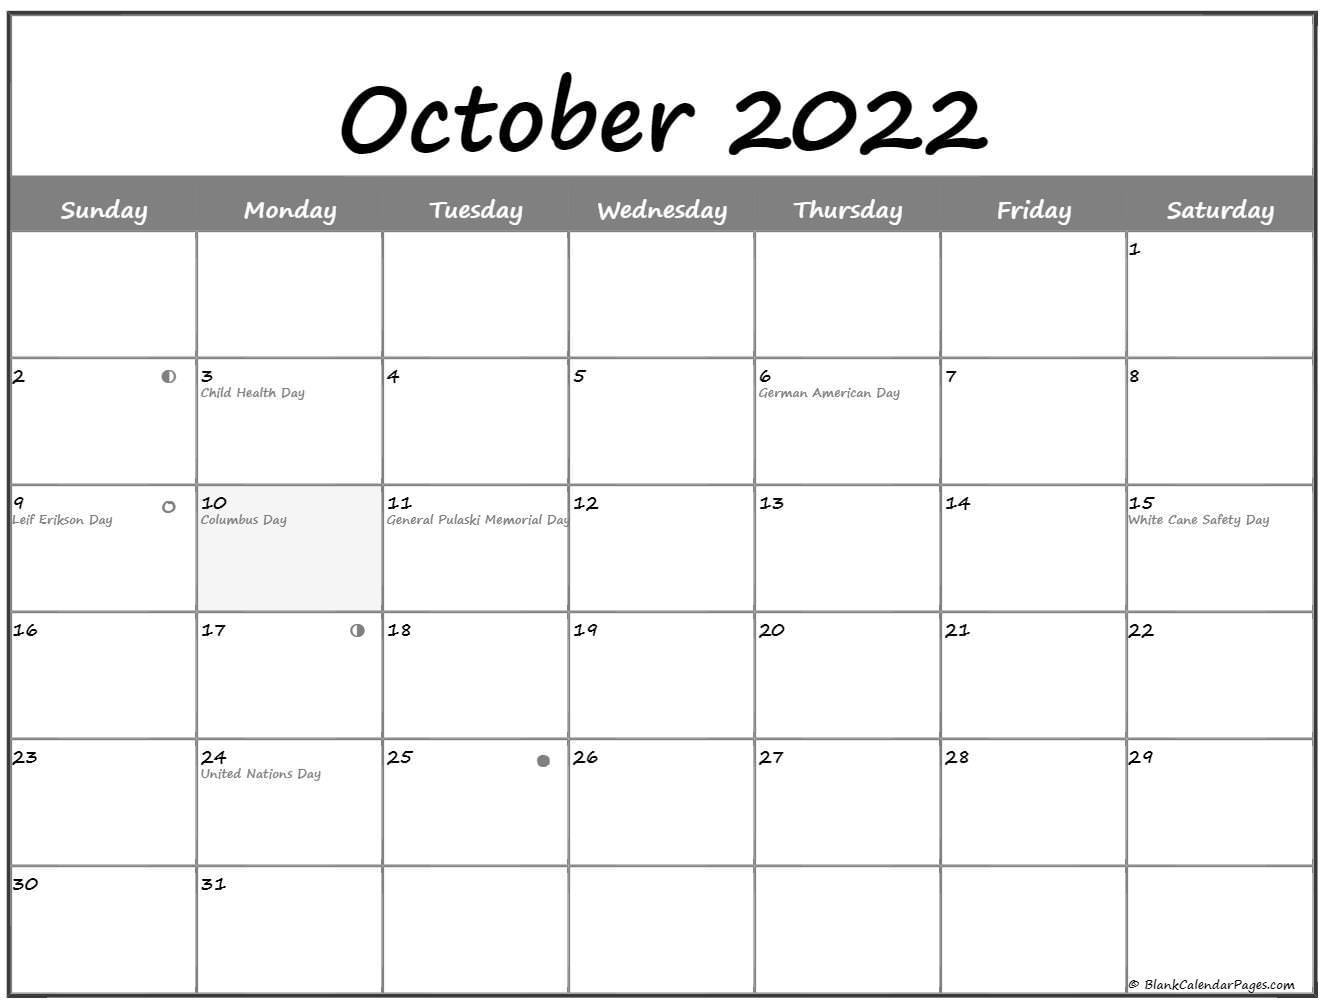 October 2022 Lunar Calendar   Moon Phase Calendar